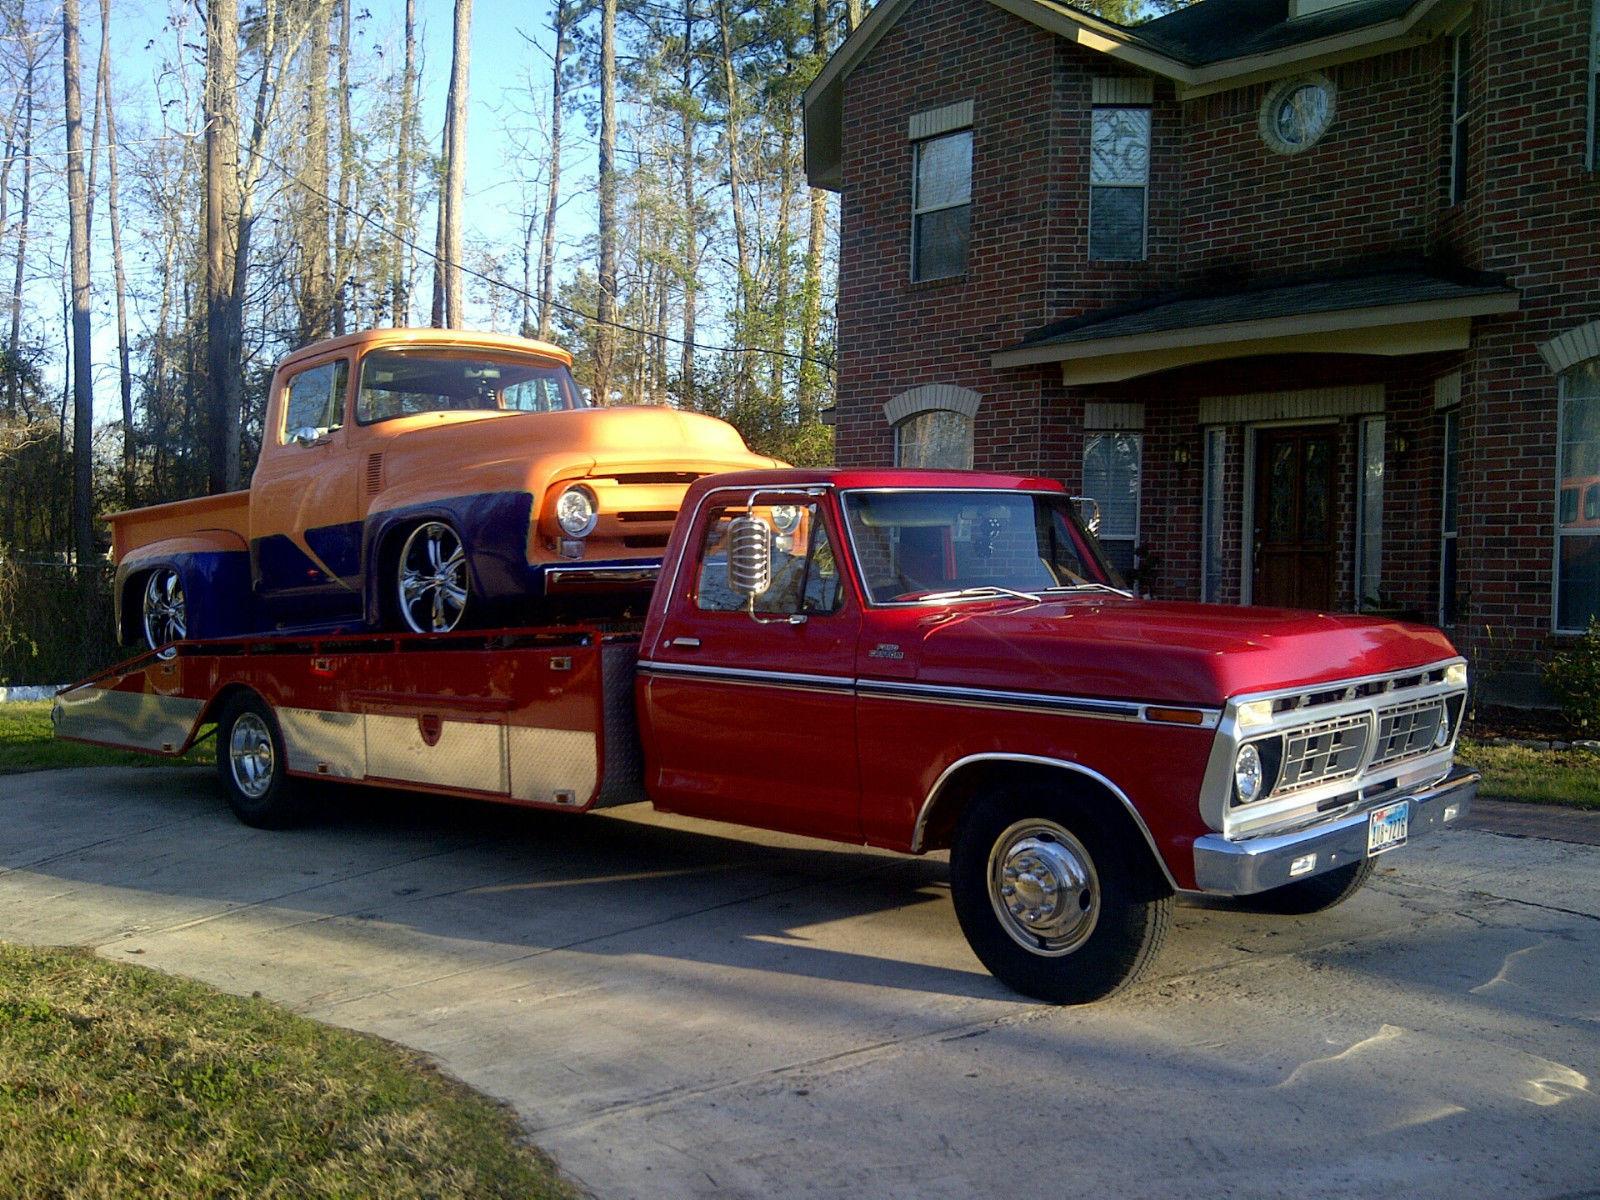 1977 Ford F350 Carhauler Ramp Truck Hodges Wedge Flatbed Flat Bed 1969 F 250 4x4 Highboy F250 F100 77